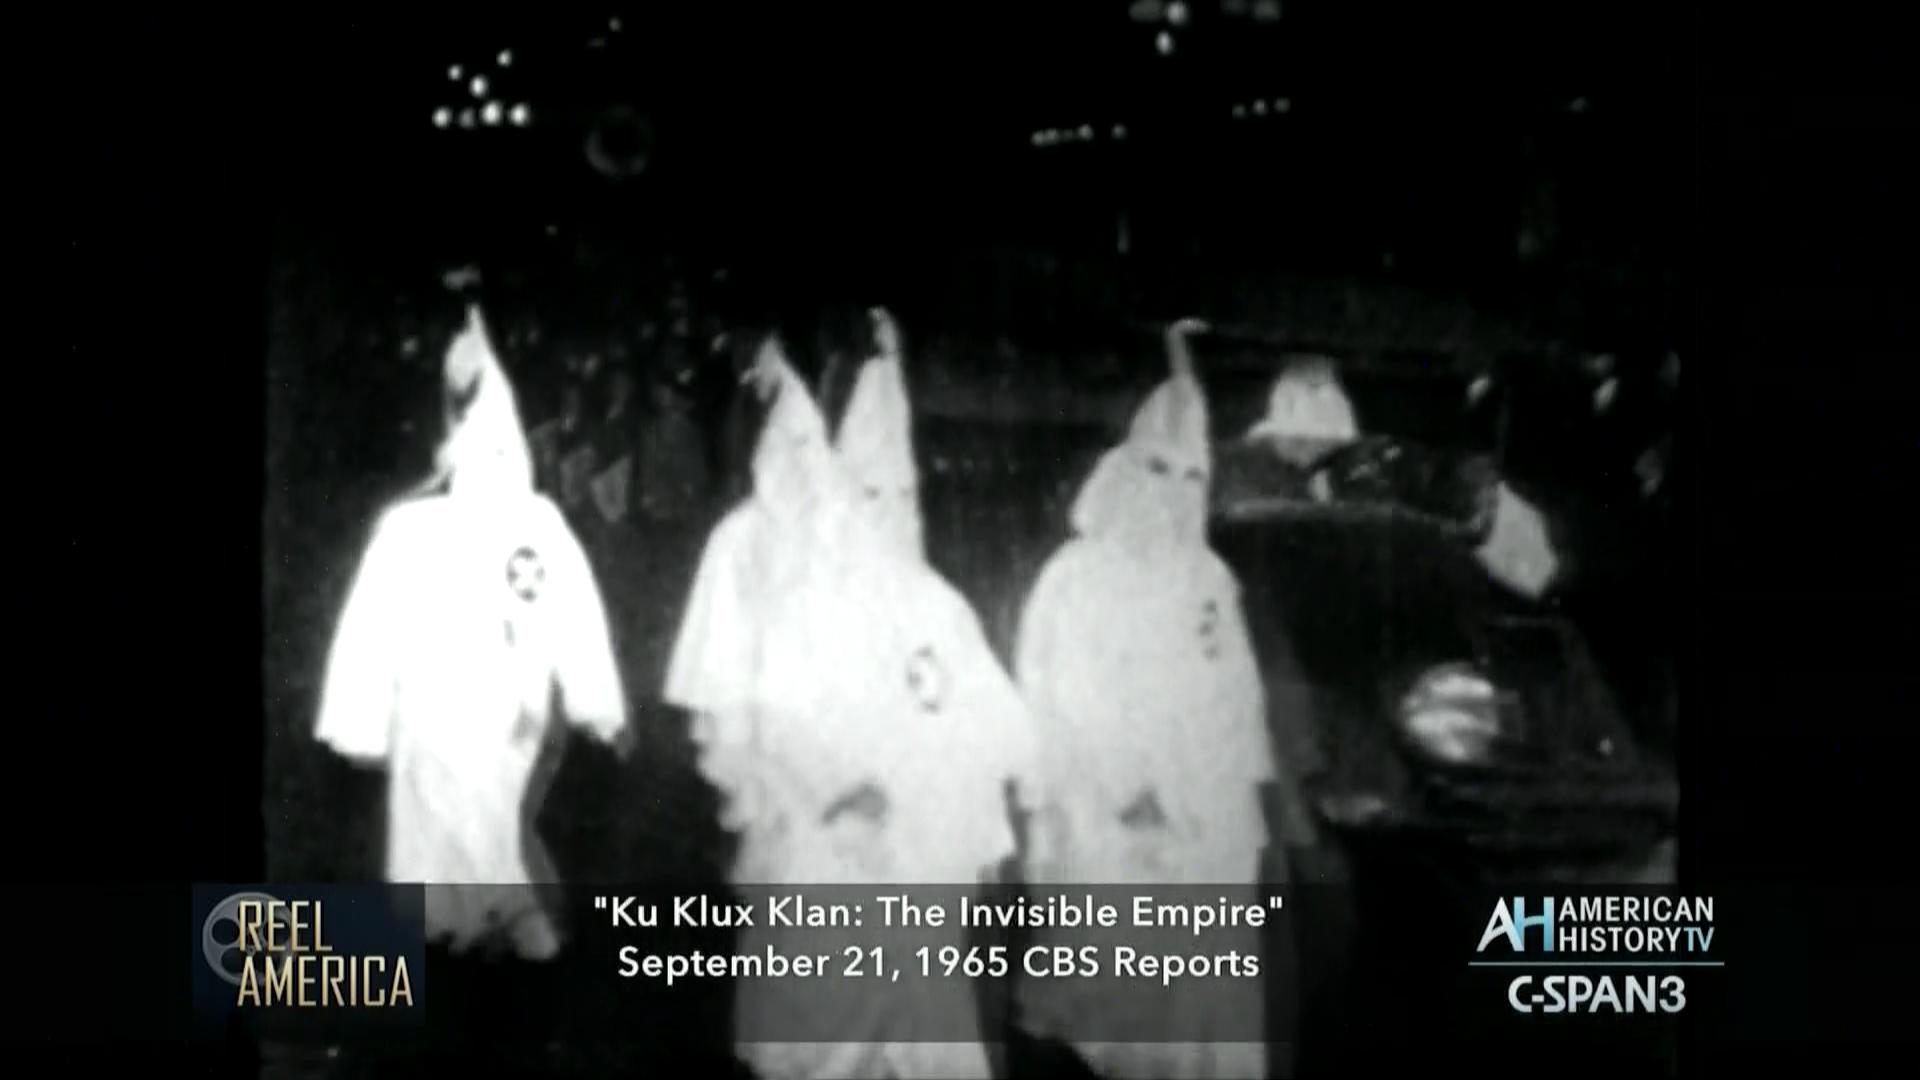 Ku Klux Klan Sep 21 1965 Video C Span